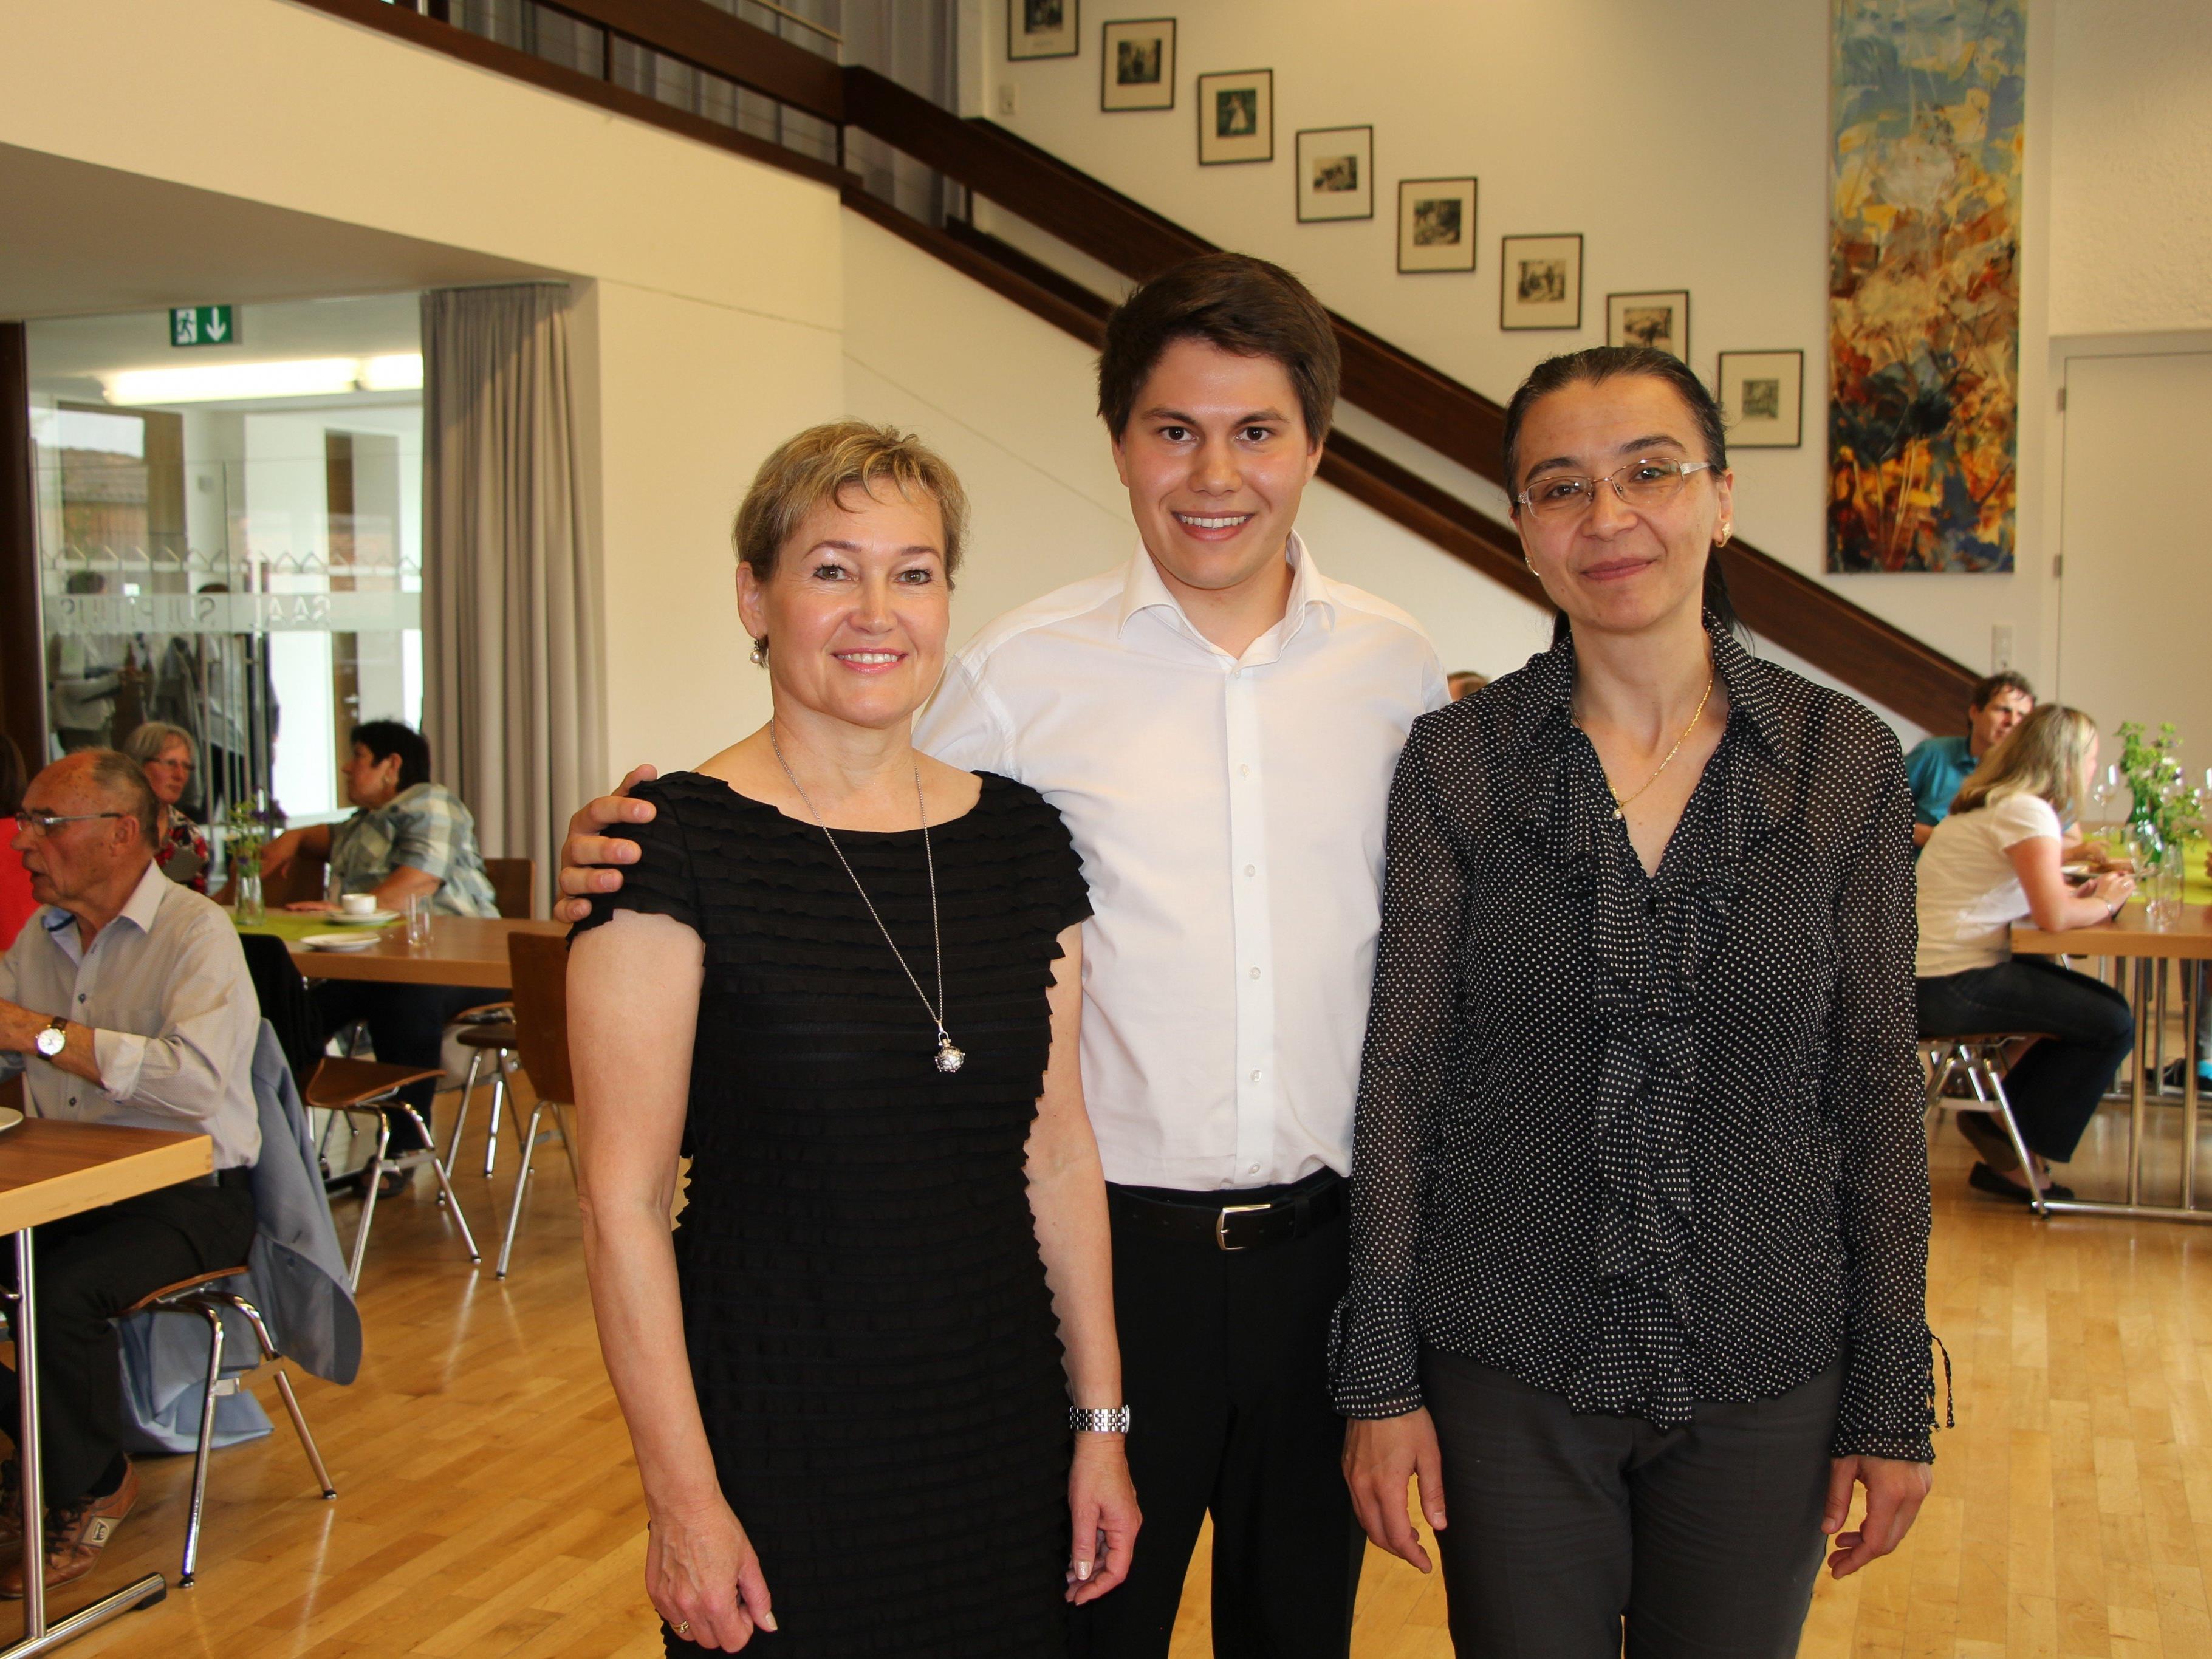 Birgit Plankel, Johannes Schmid und Danaila Deleva.